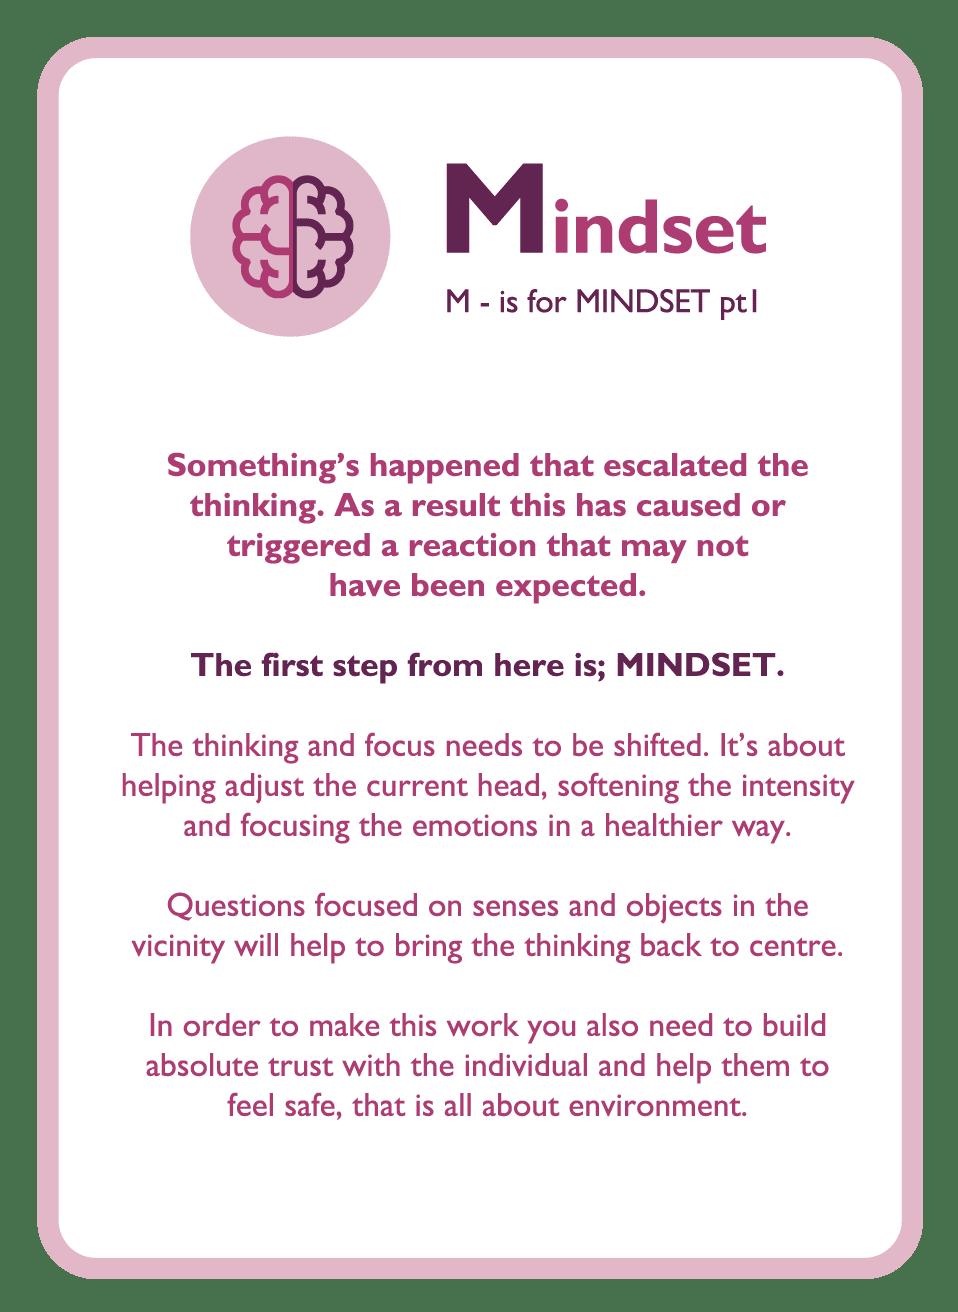 Coaching card titled Mindset